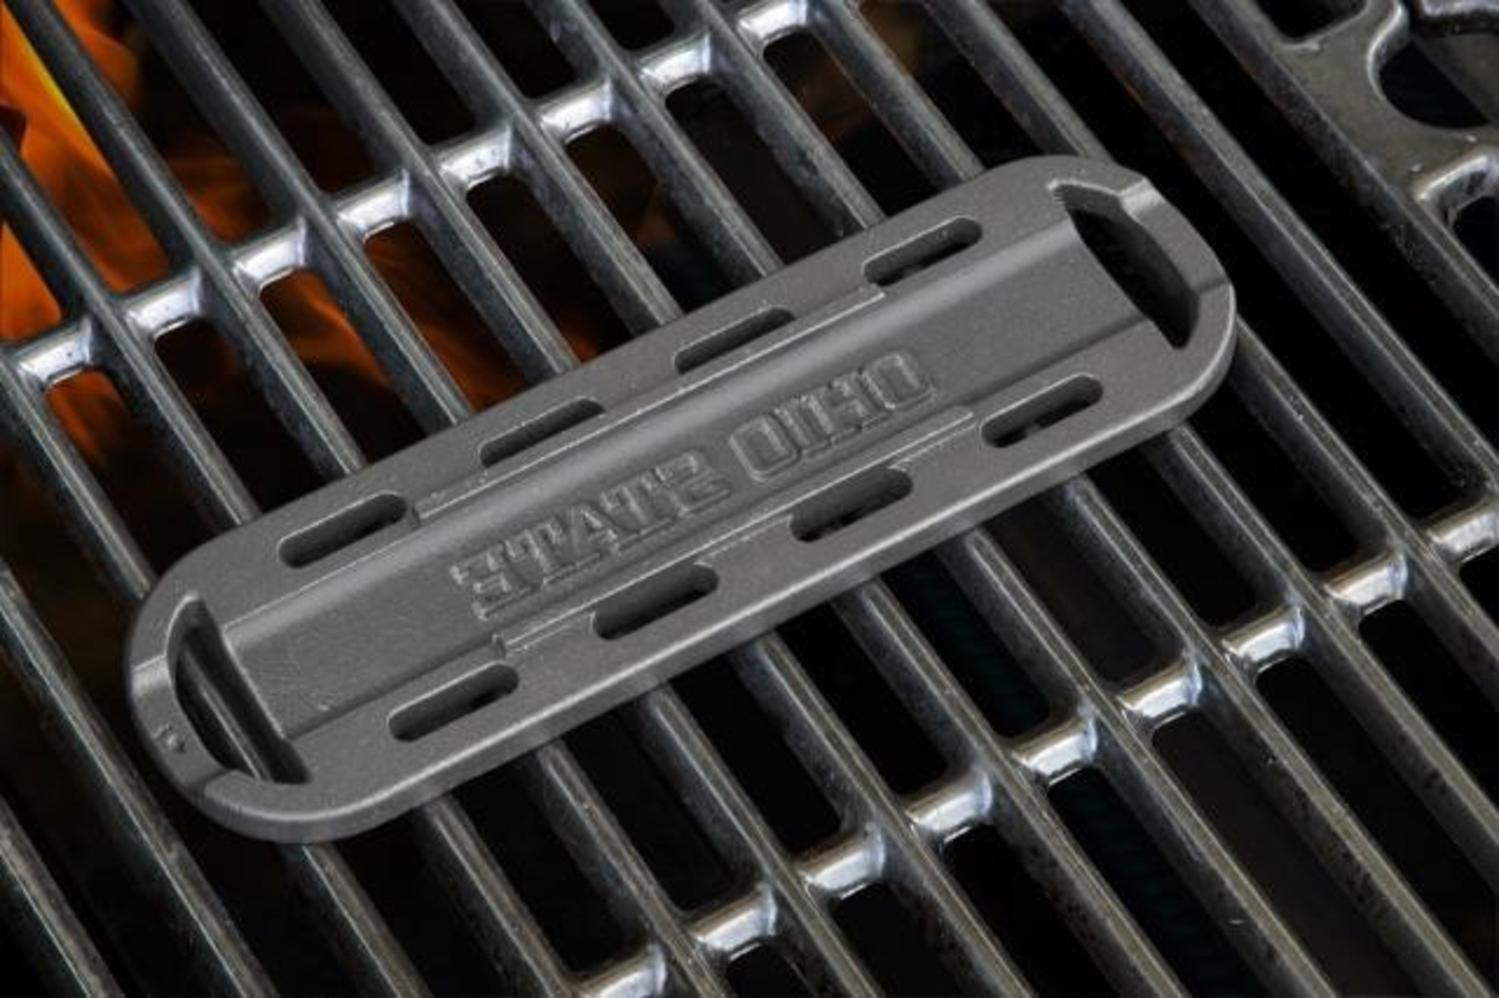 Ohio State University Hot Dog ''OHIO STATE'' Branding Grill Iron Accessory